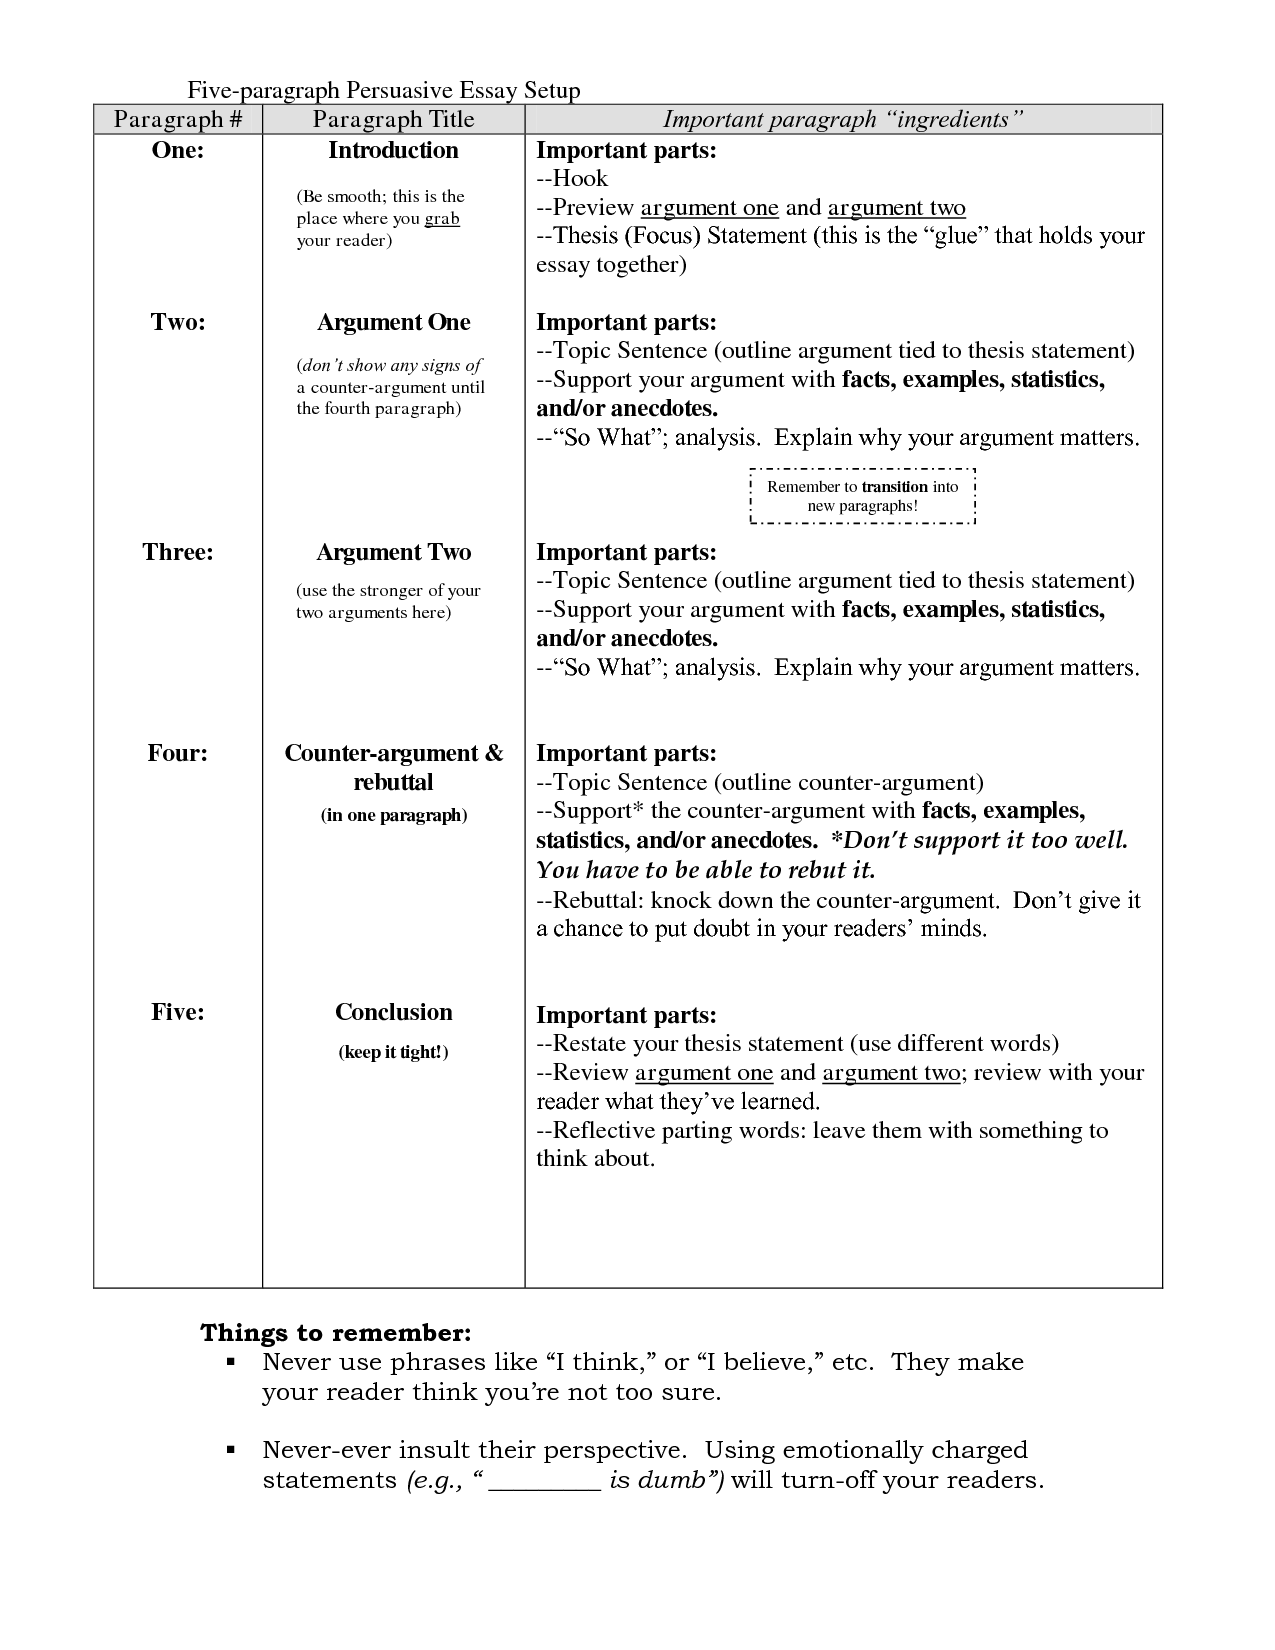 how to write a persuasive argument essay   Persuasive essays ...